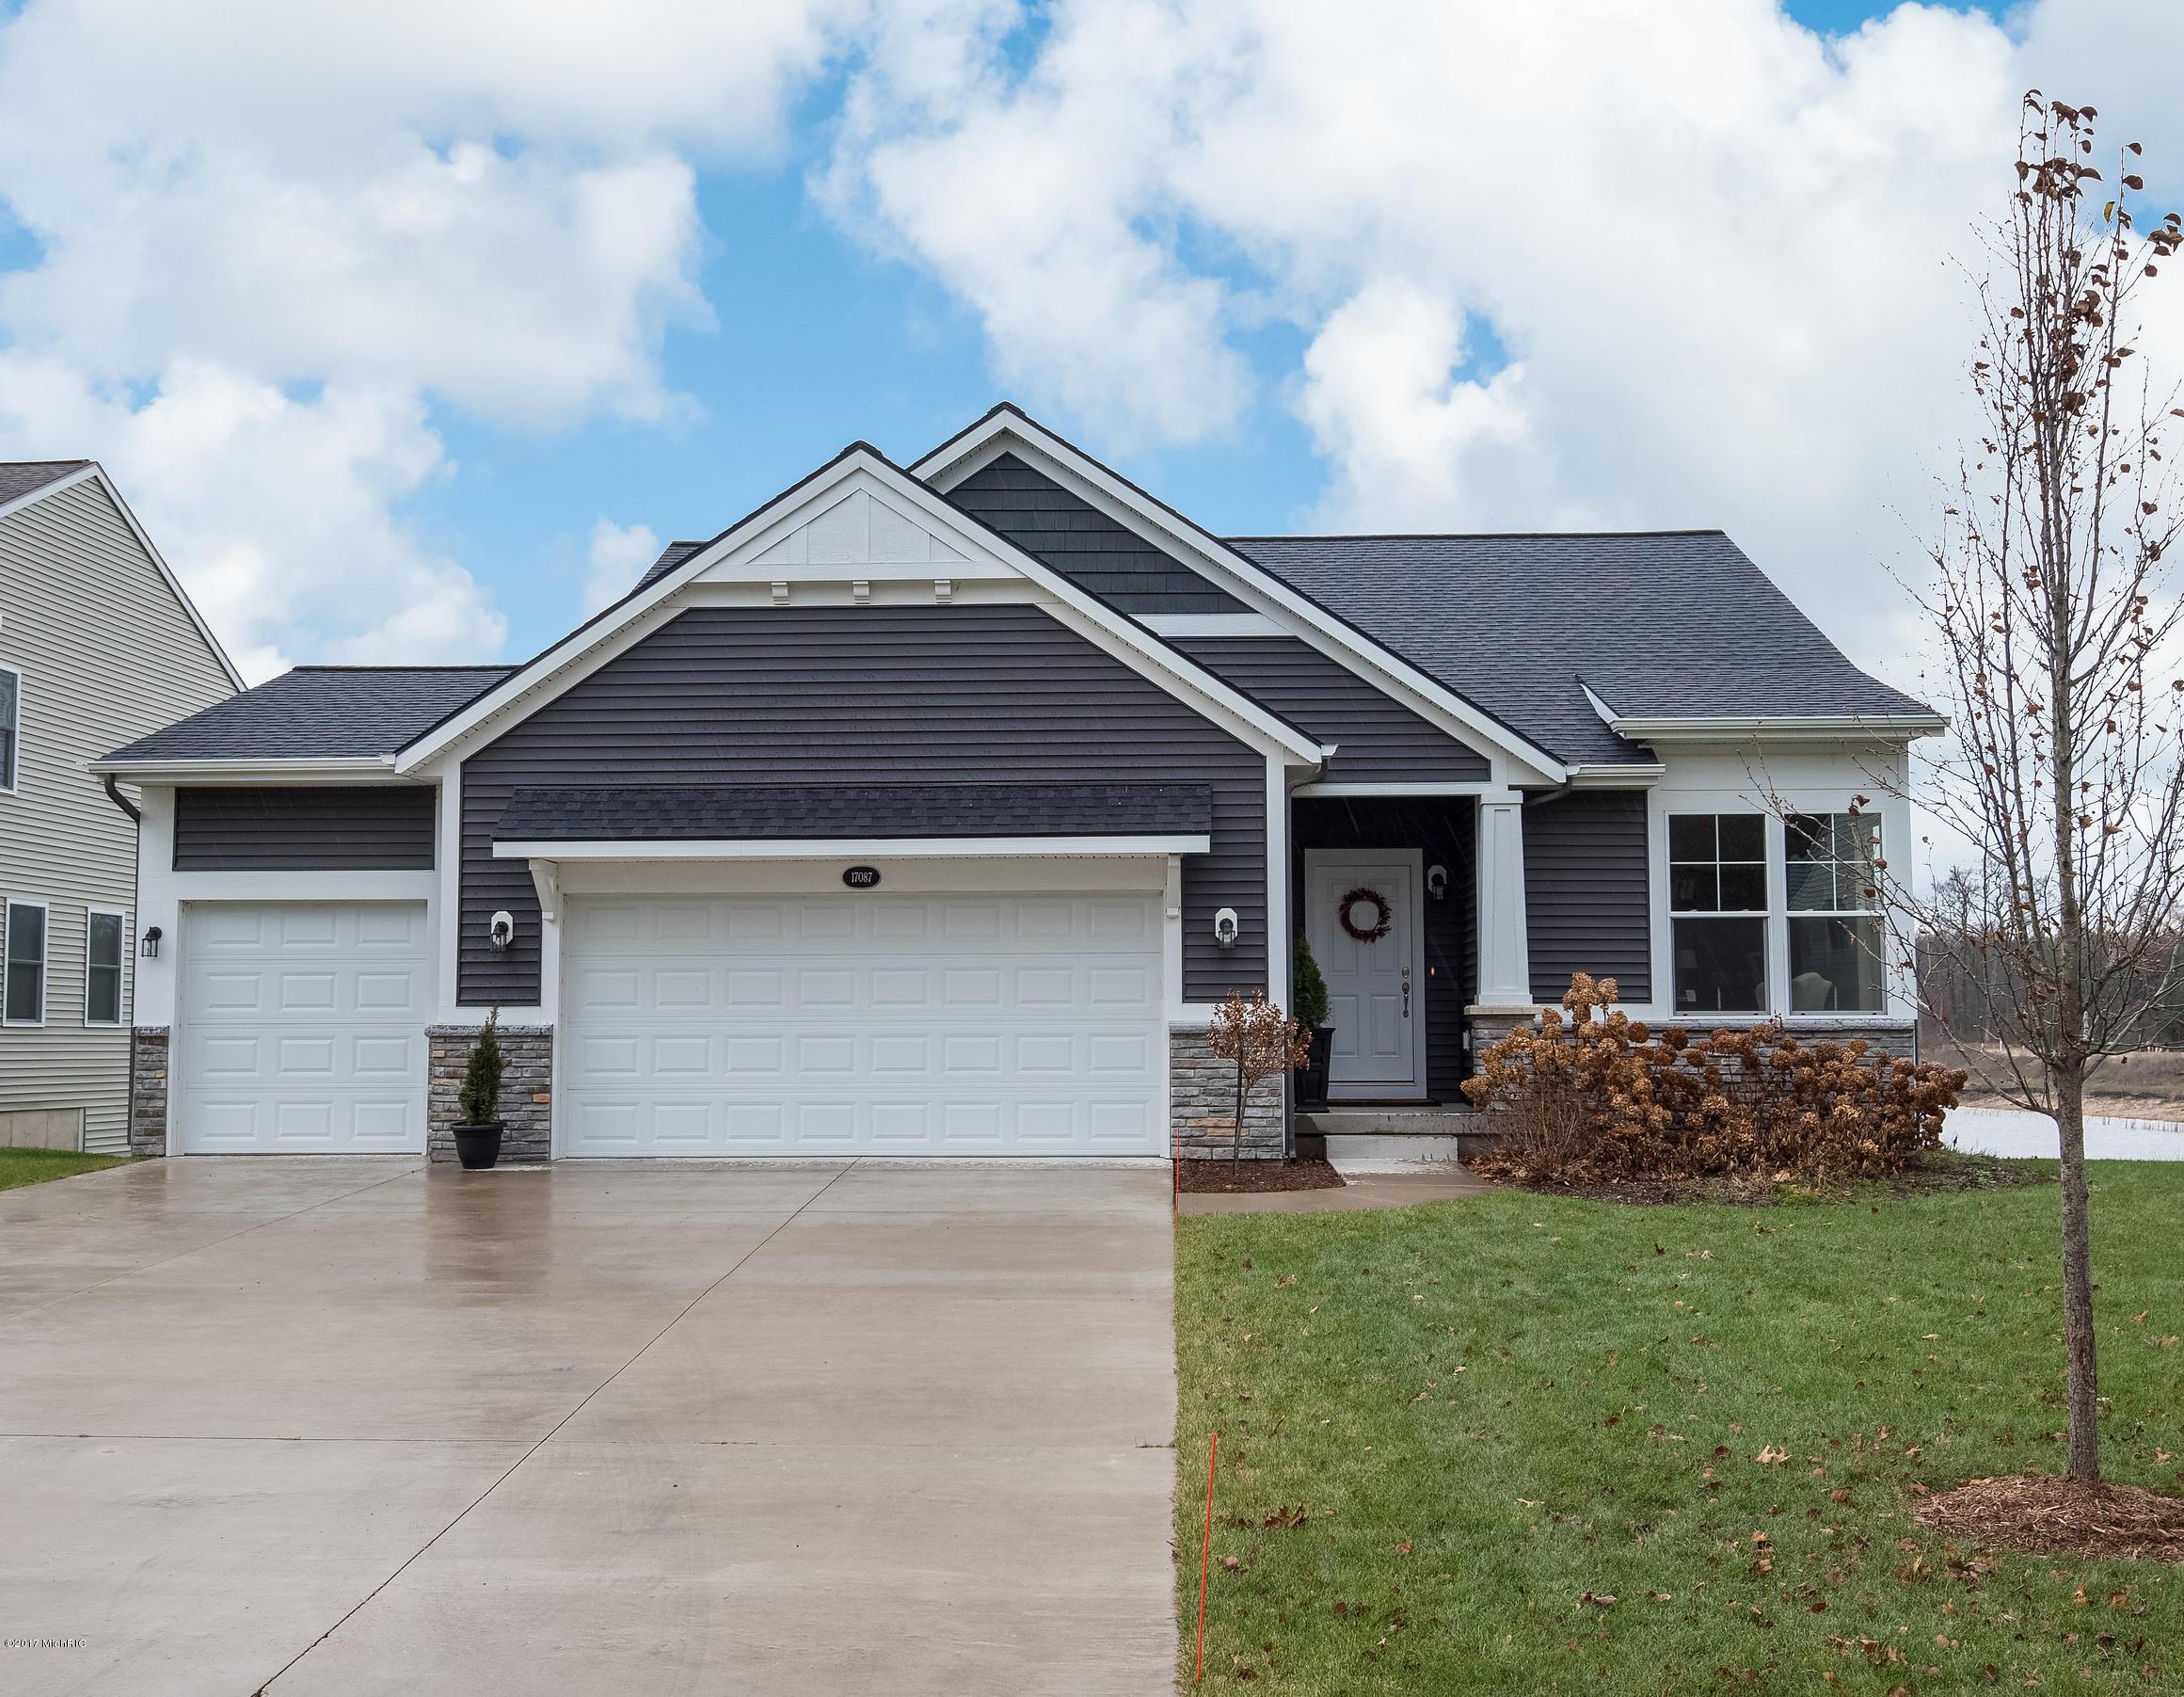 Single Family Home for Sale at 17087 Birchview 17087 Birchview Nunica, Michigan 49448 United States